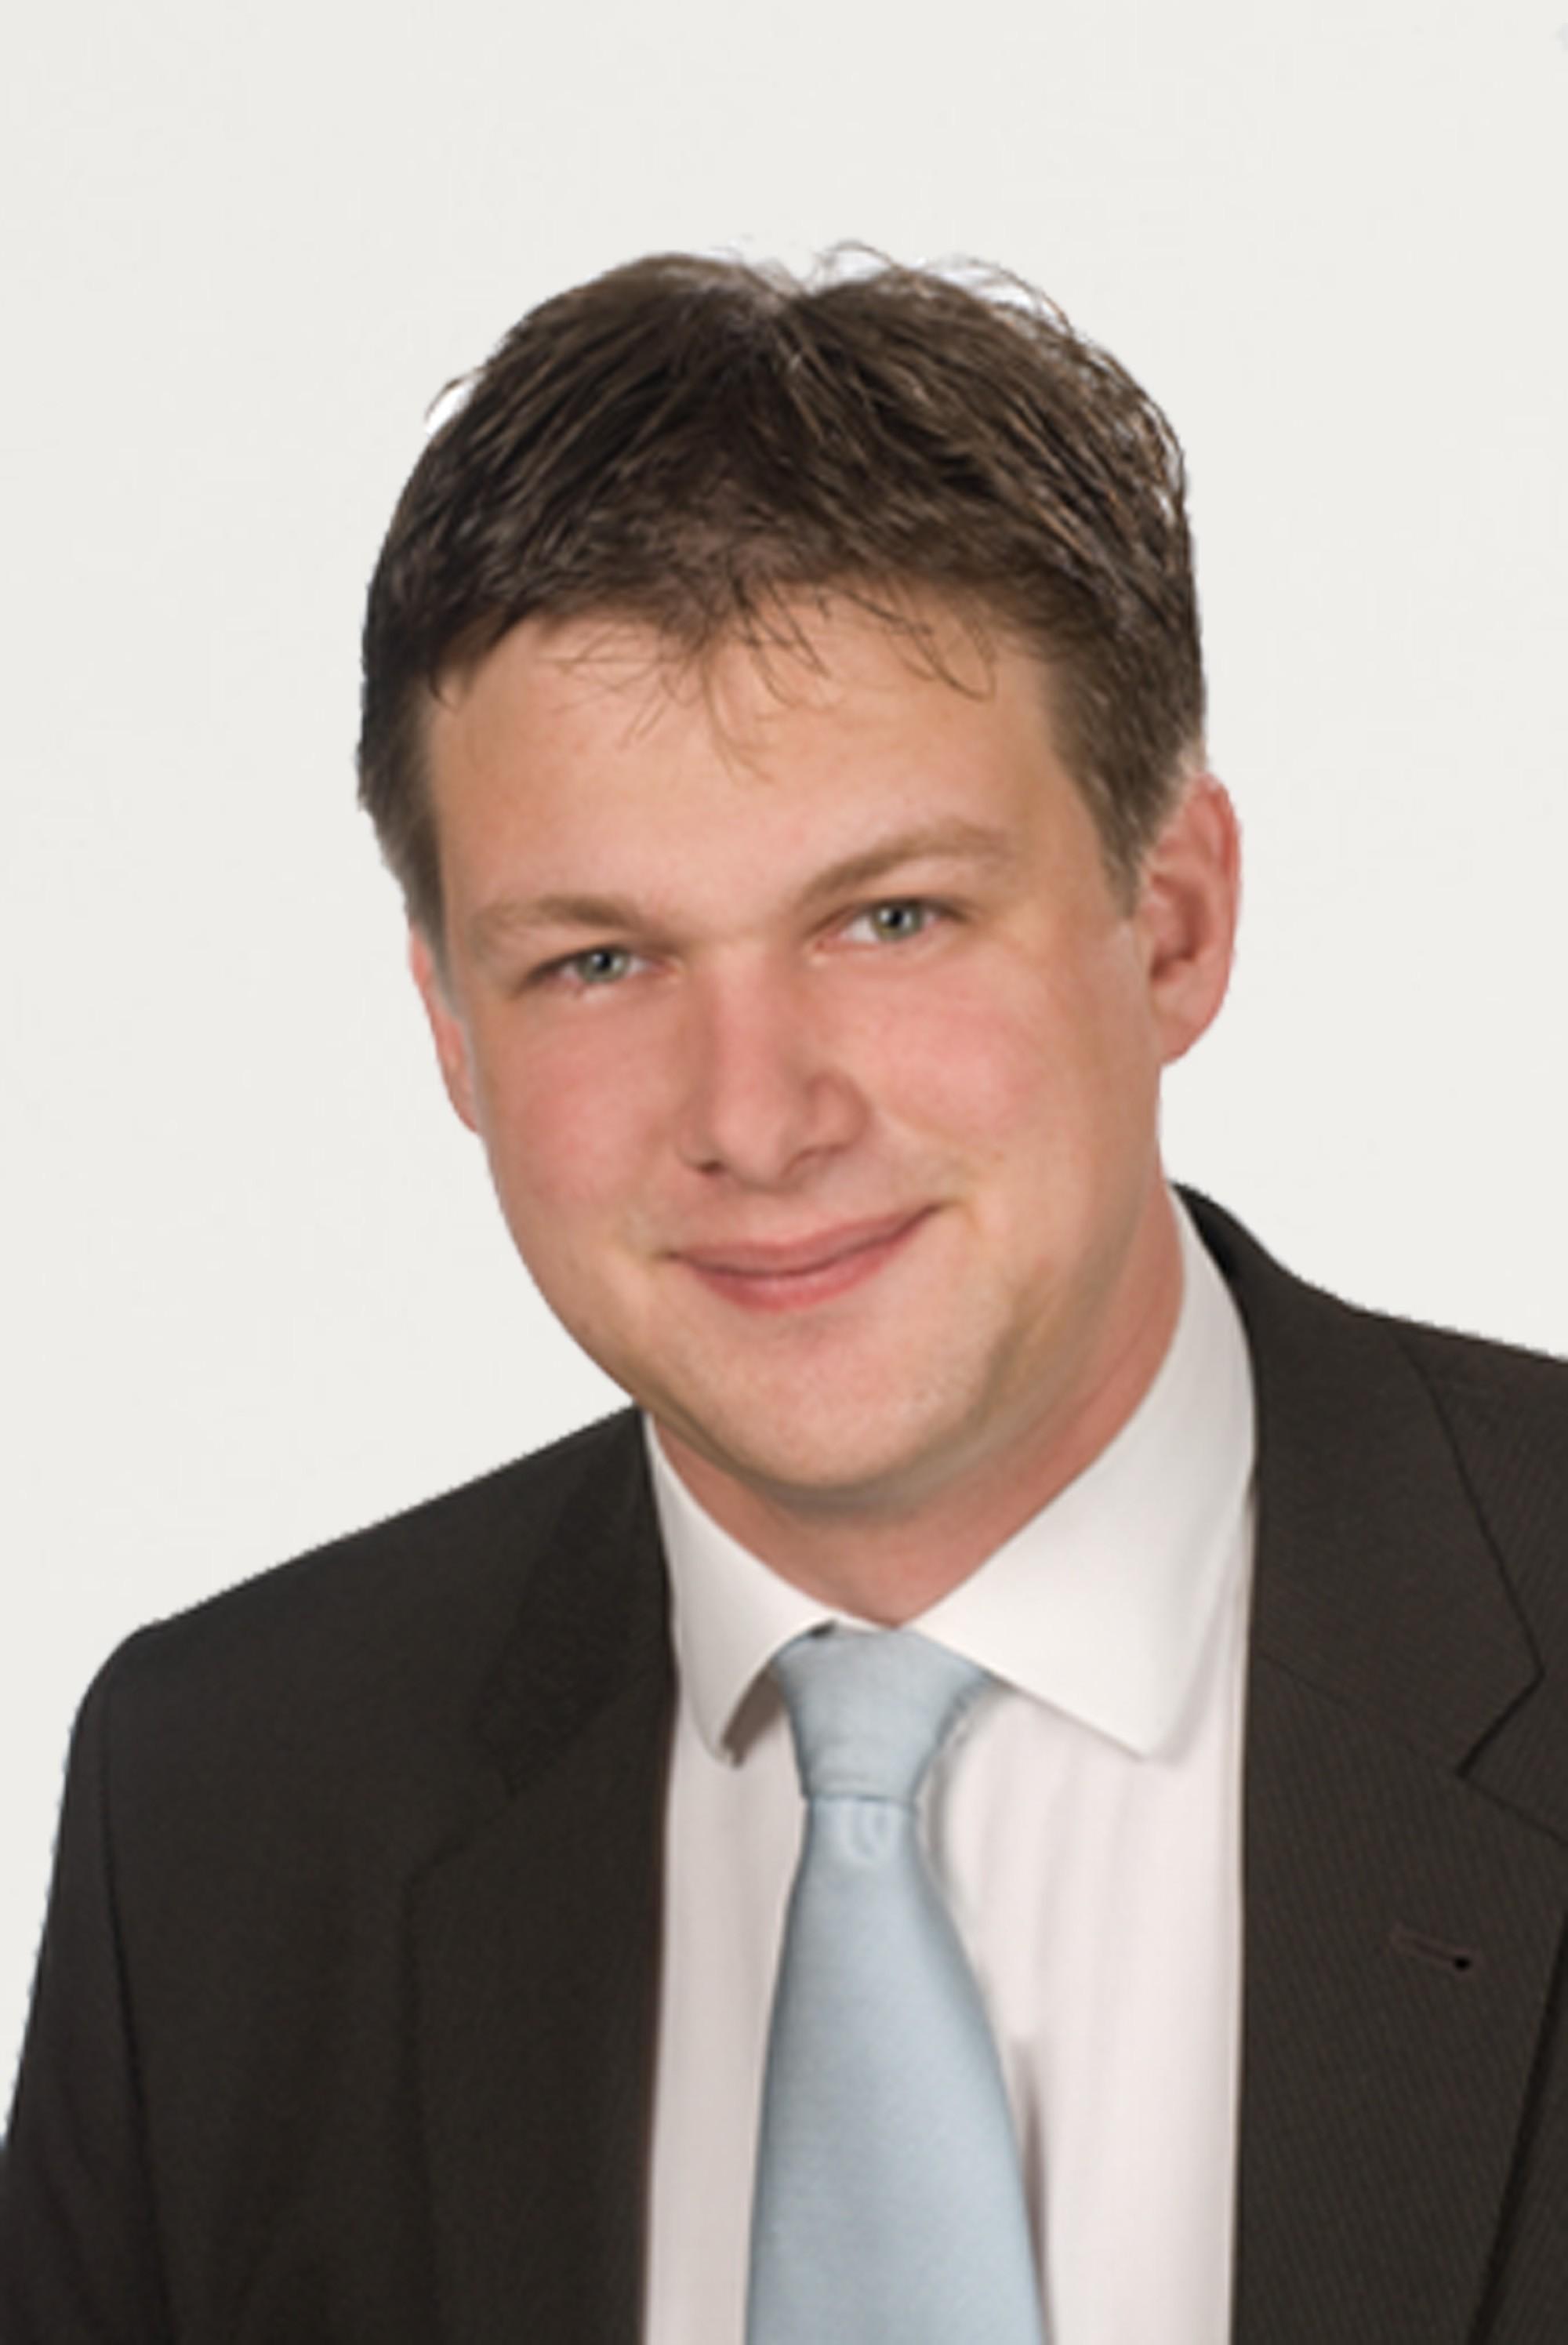 Conservative German MP Who lobbied For North Macedonia's Fugitive ex-PM Nikola Gruevski Resigns